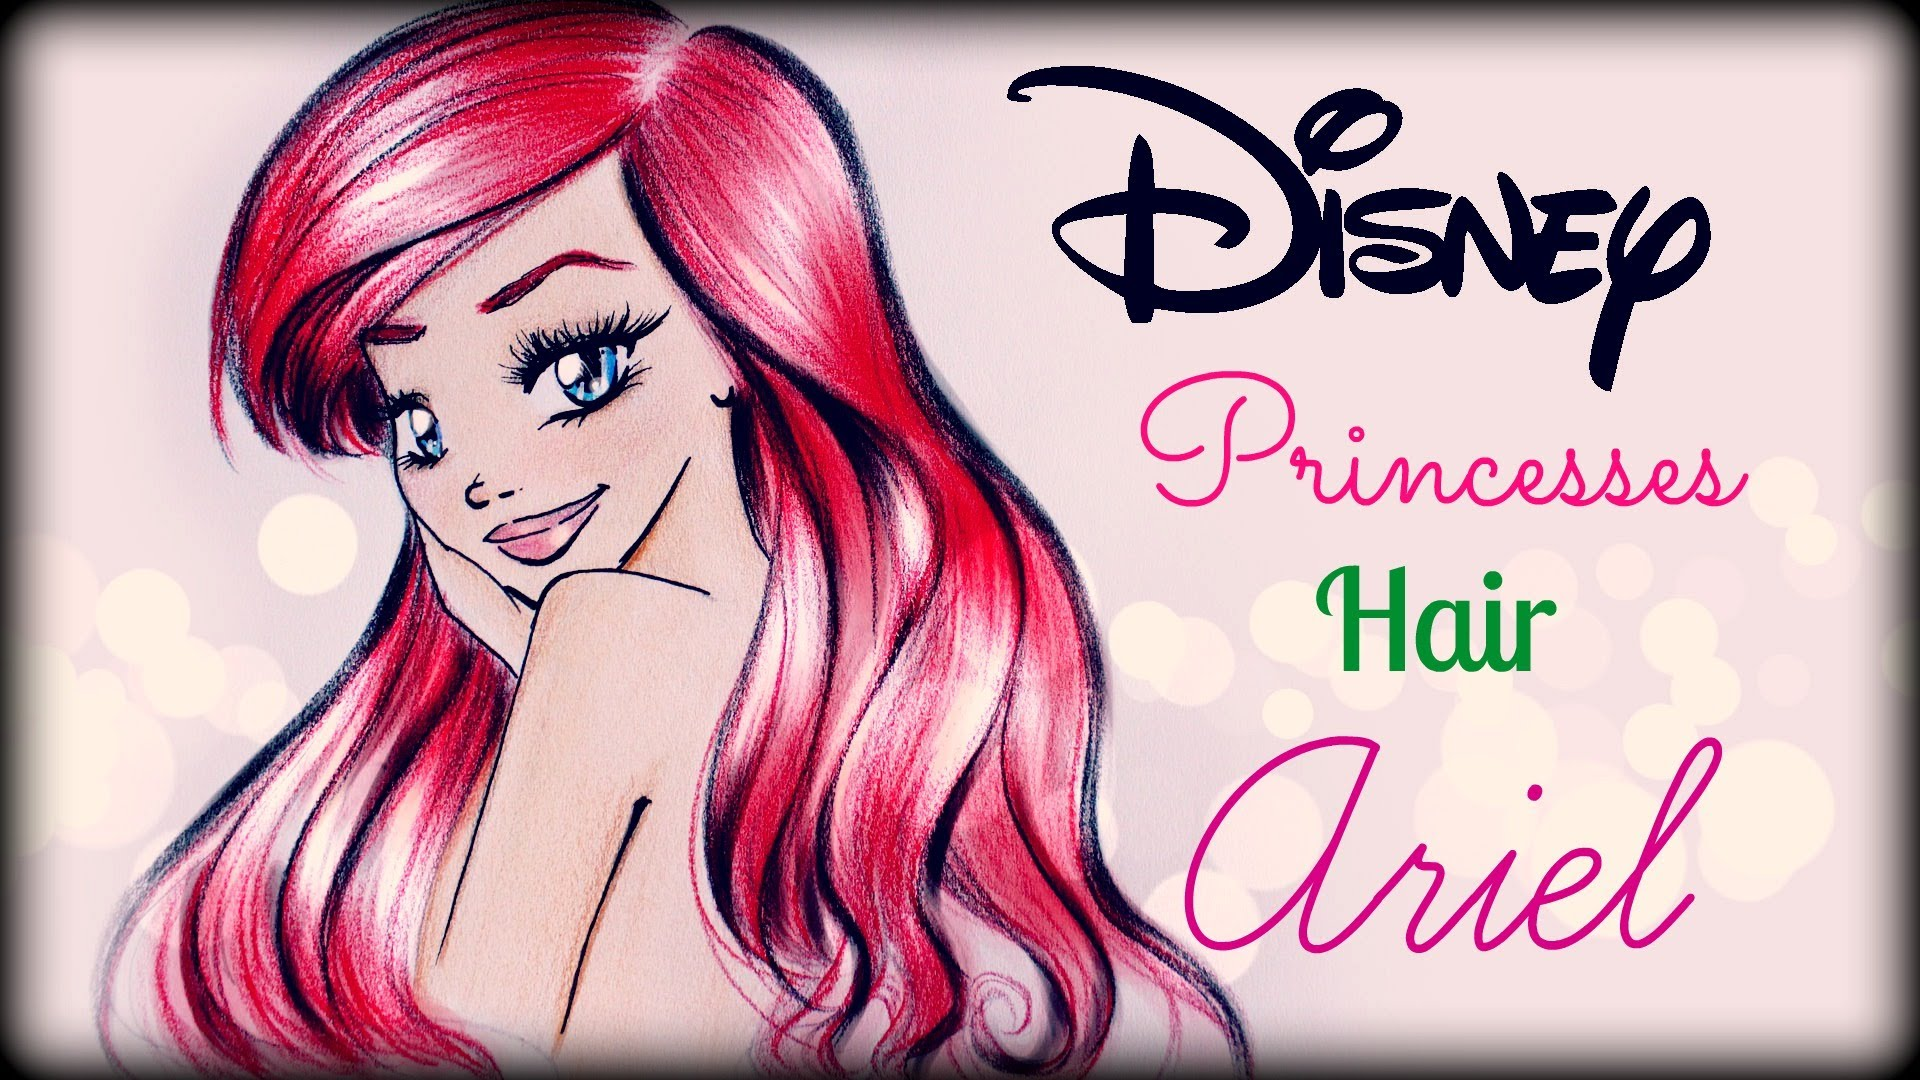 Drawn princess hairstyle disney YouTube Ariel ❤ How